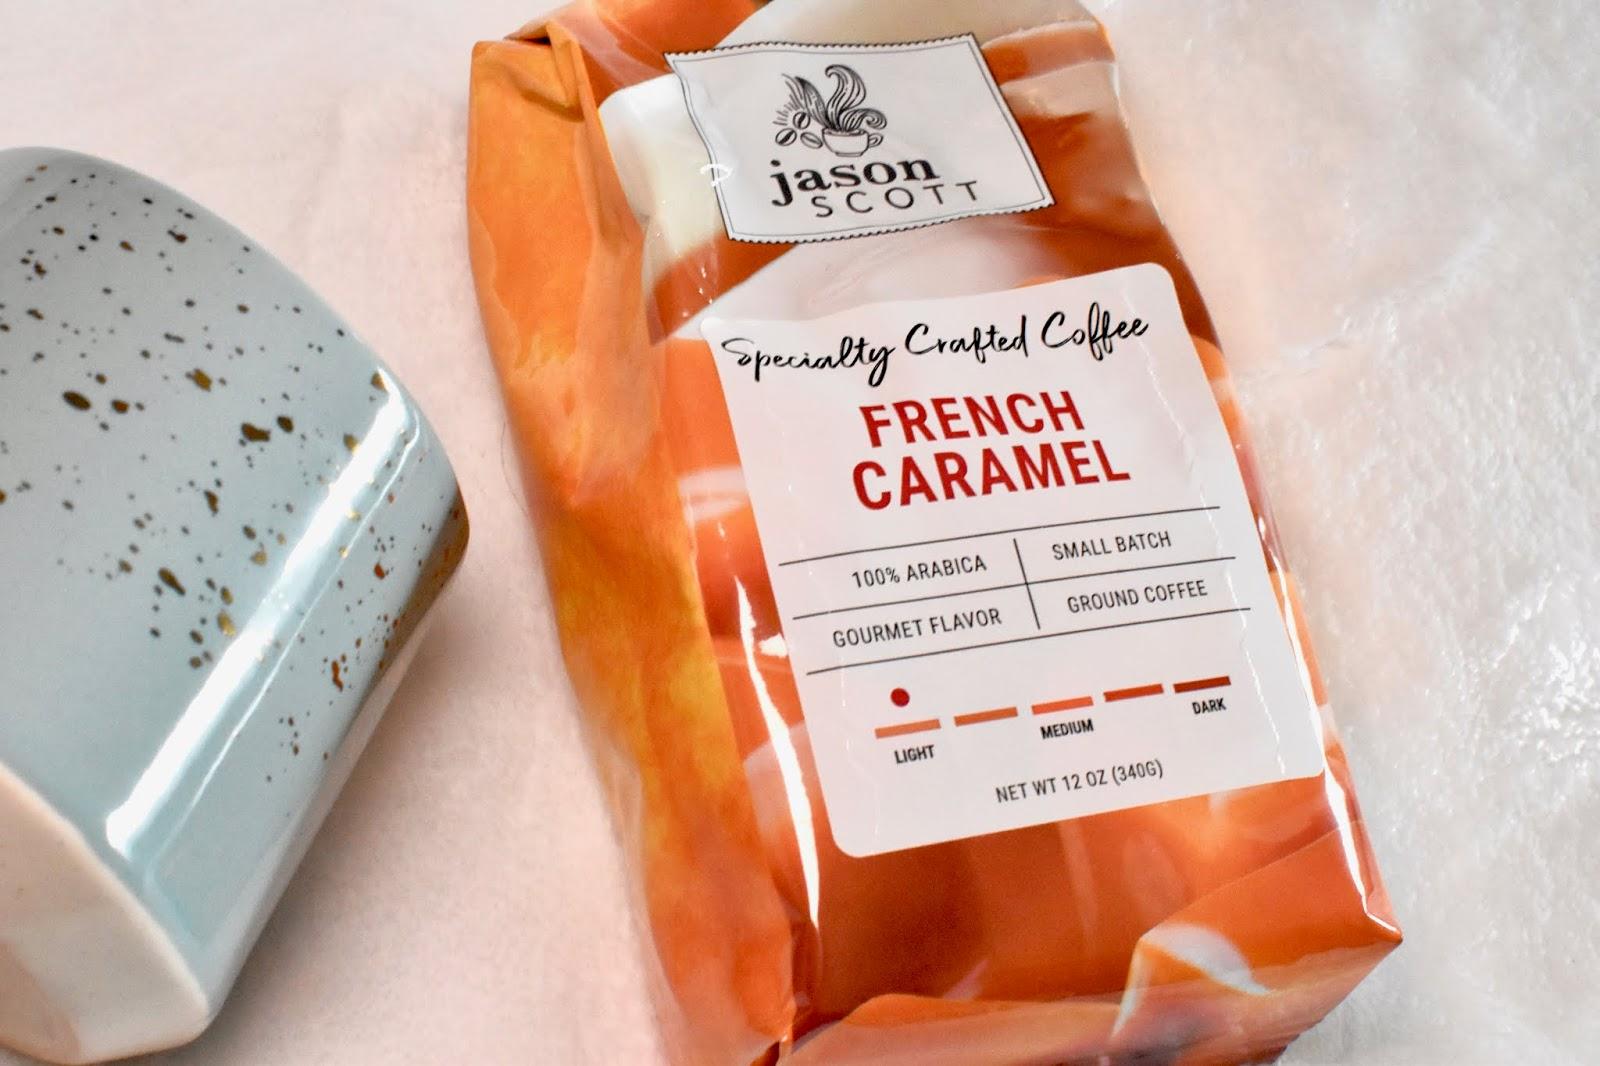 Jason Scott French Caramel Coffee